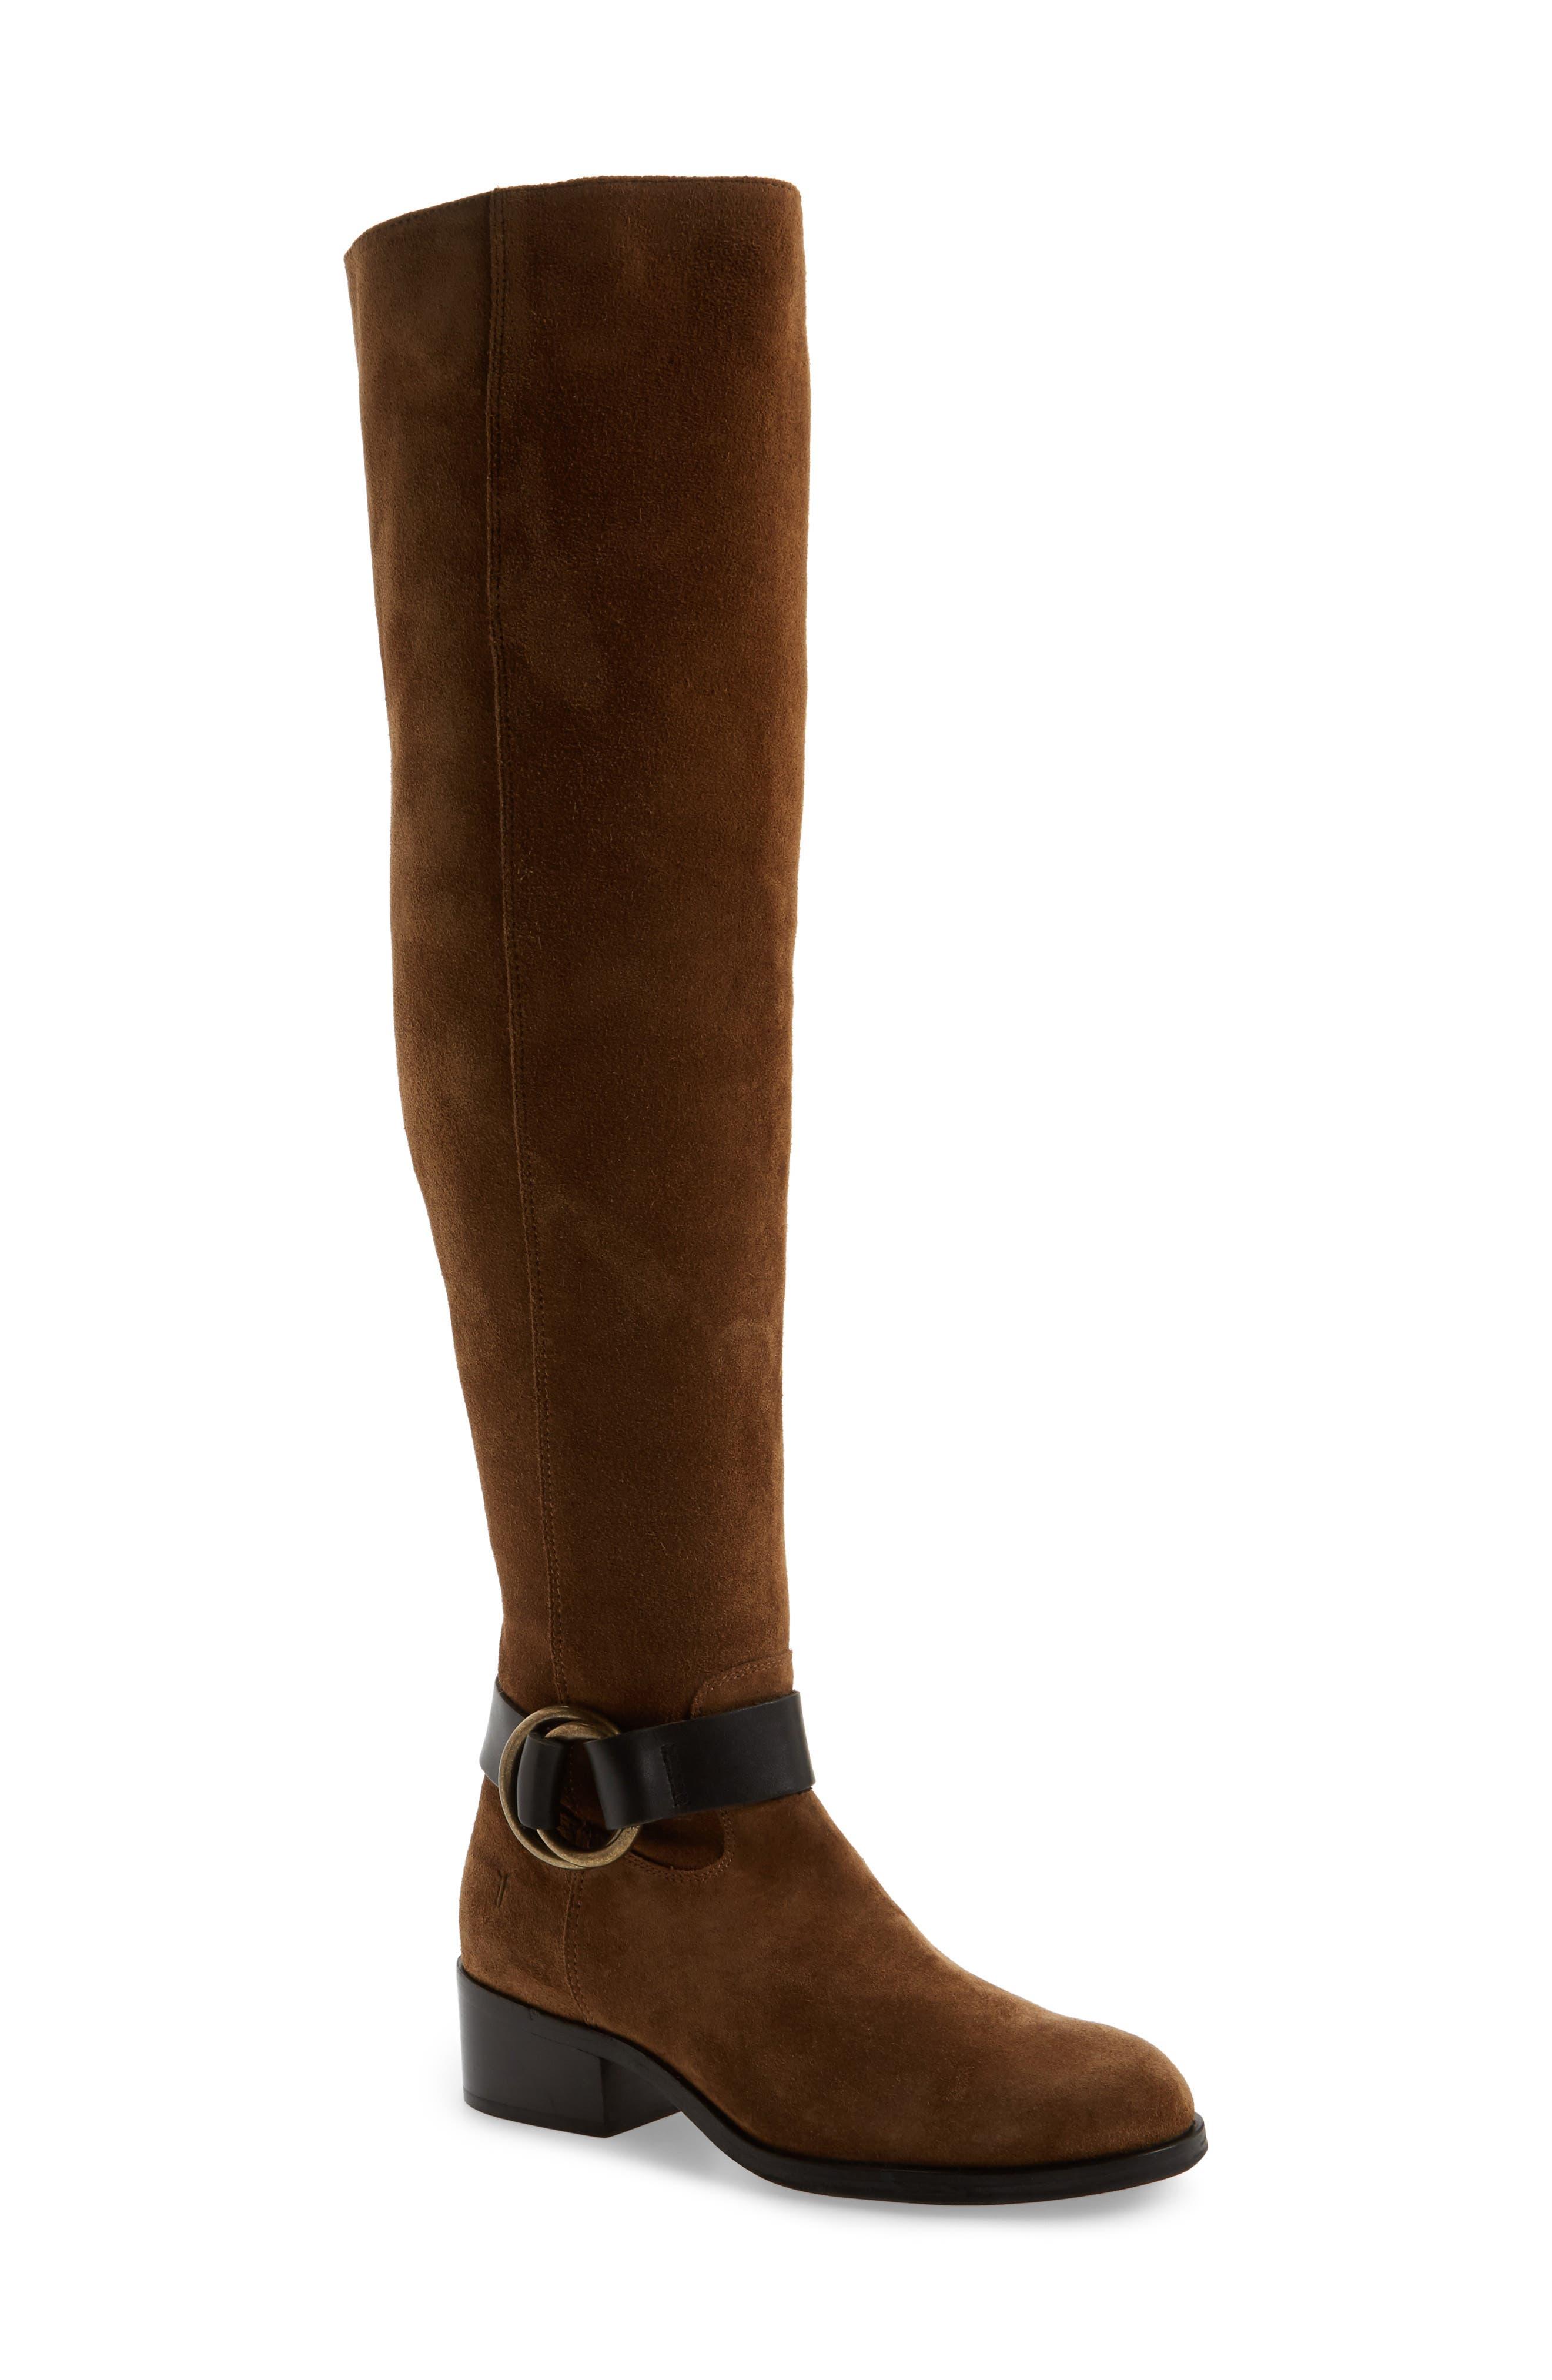 Alternate Image 1 Selected - Frye Kristen Harness Over the Knee Boot (Women)